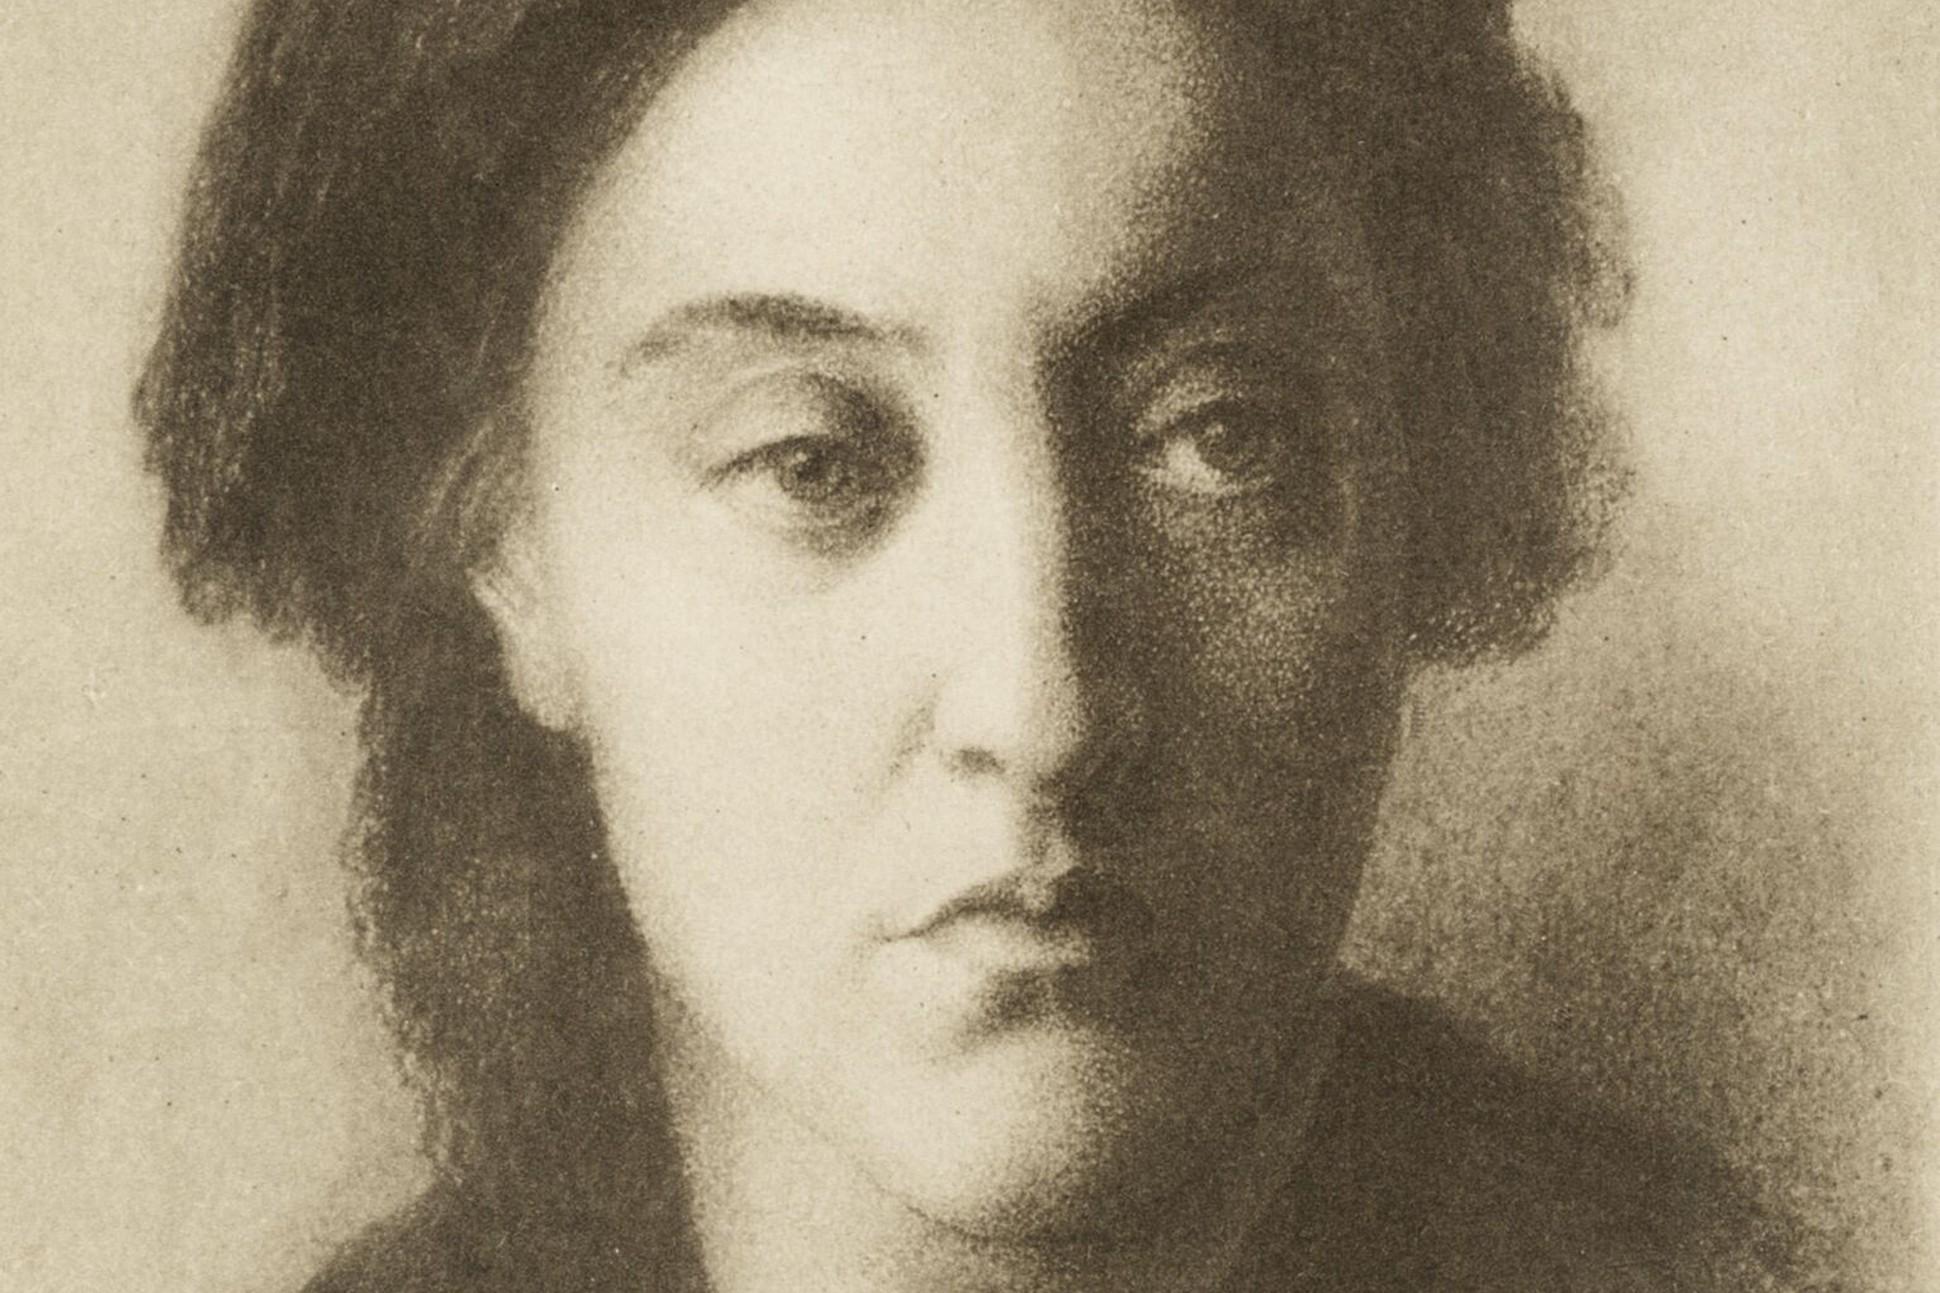 Image of Christina Rossetti.